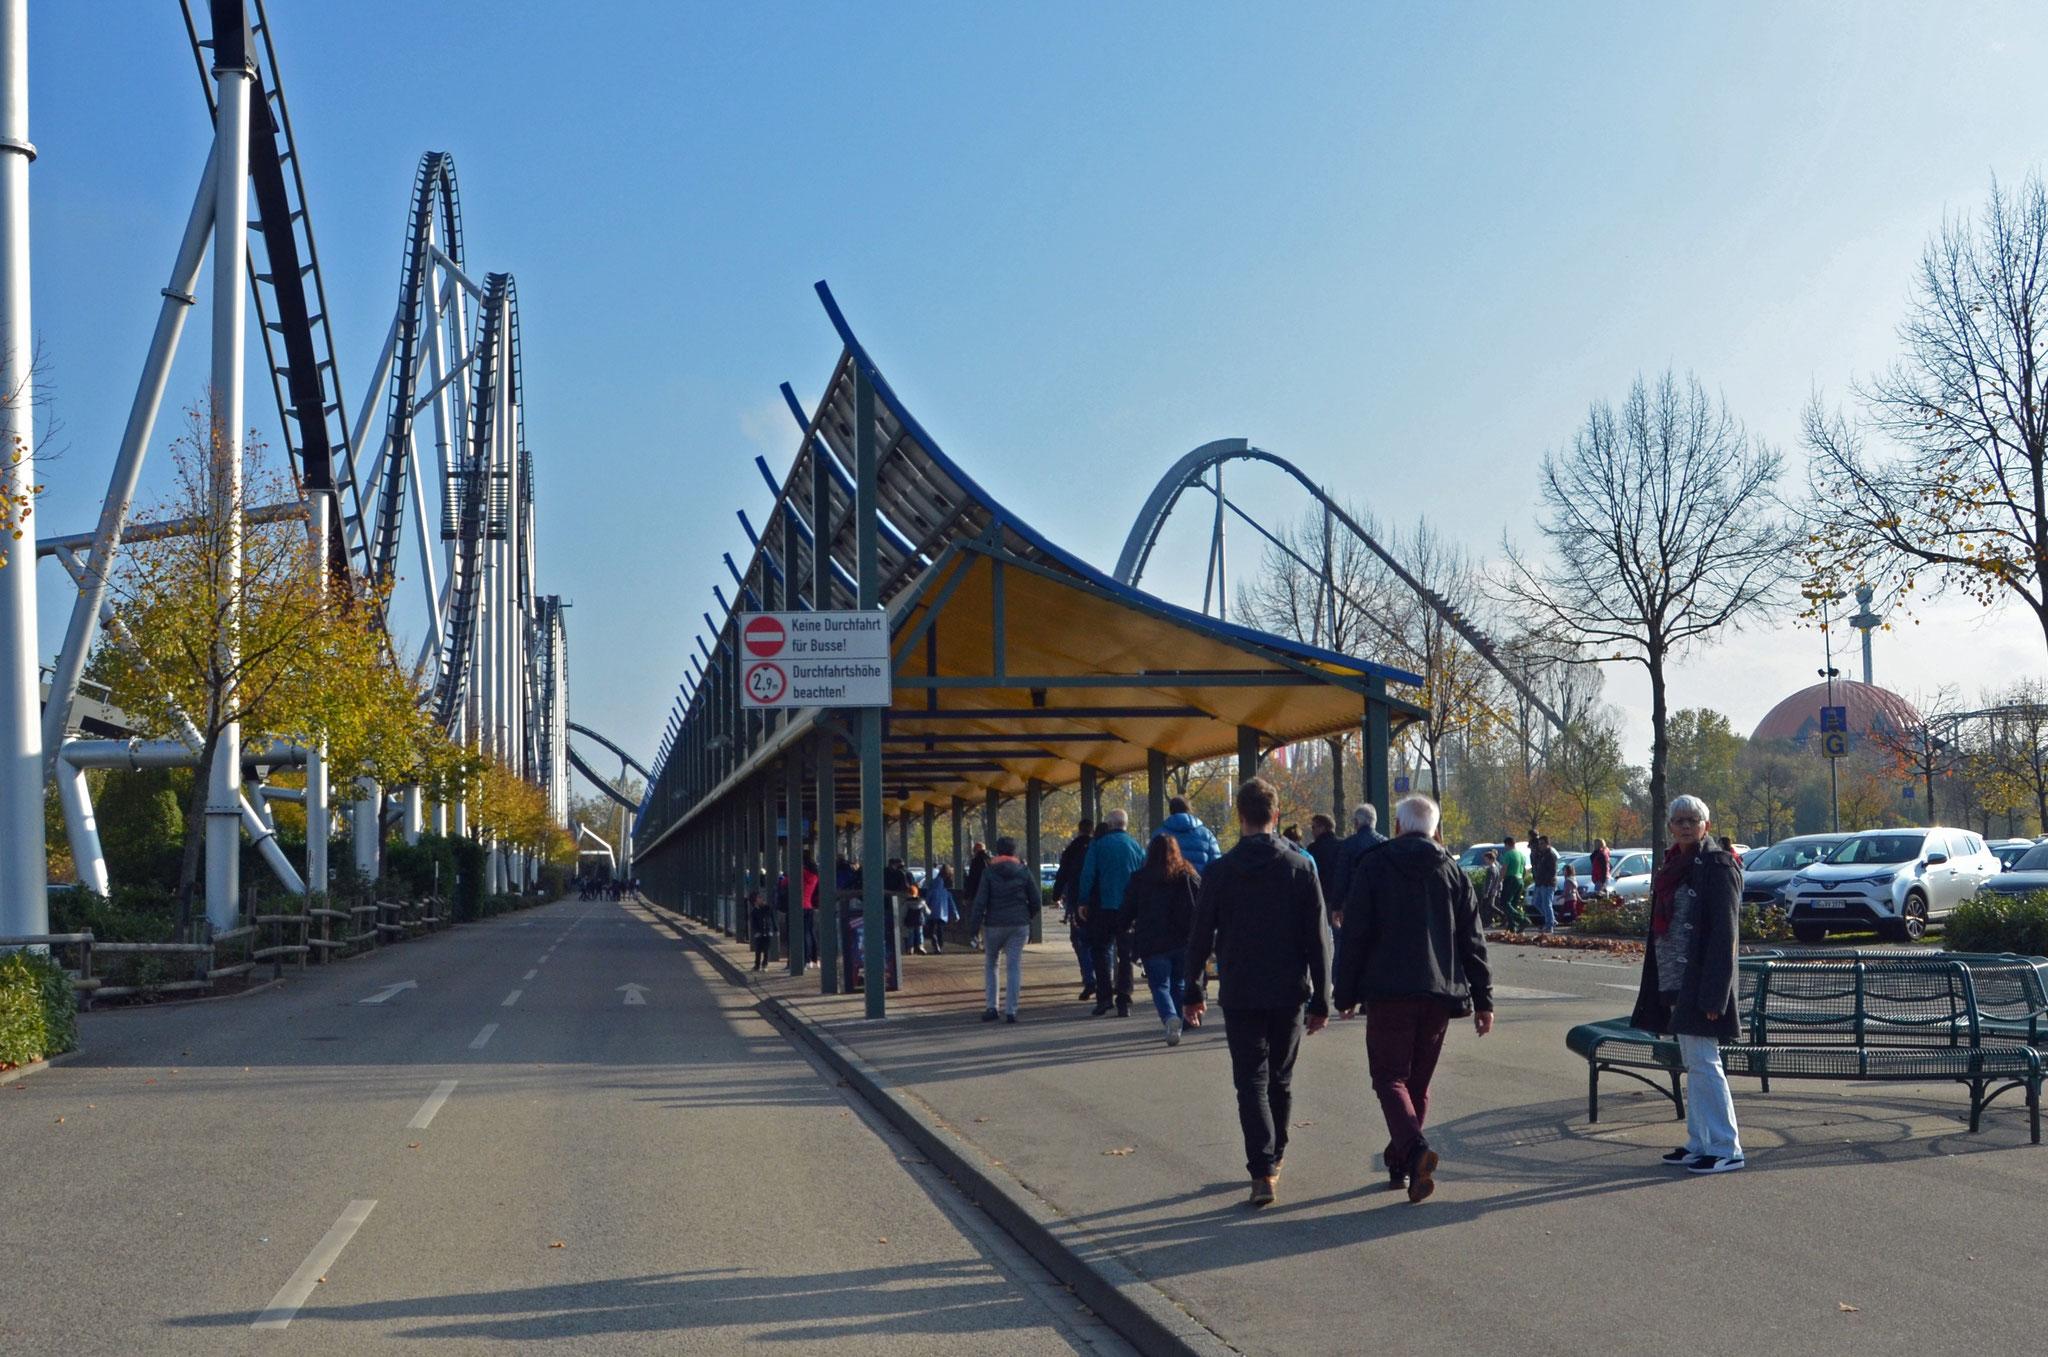 2. Tag, Besuch im Europapark Rust